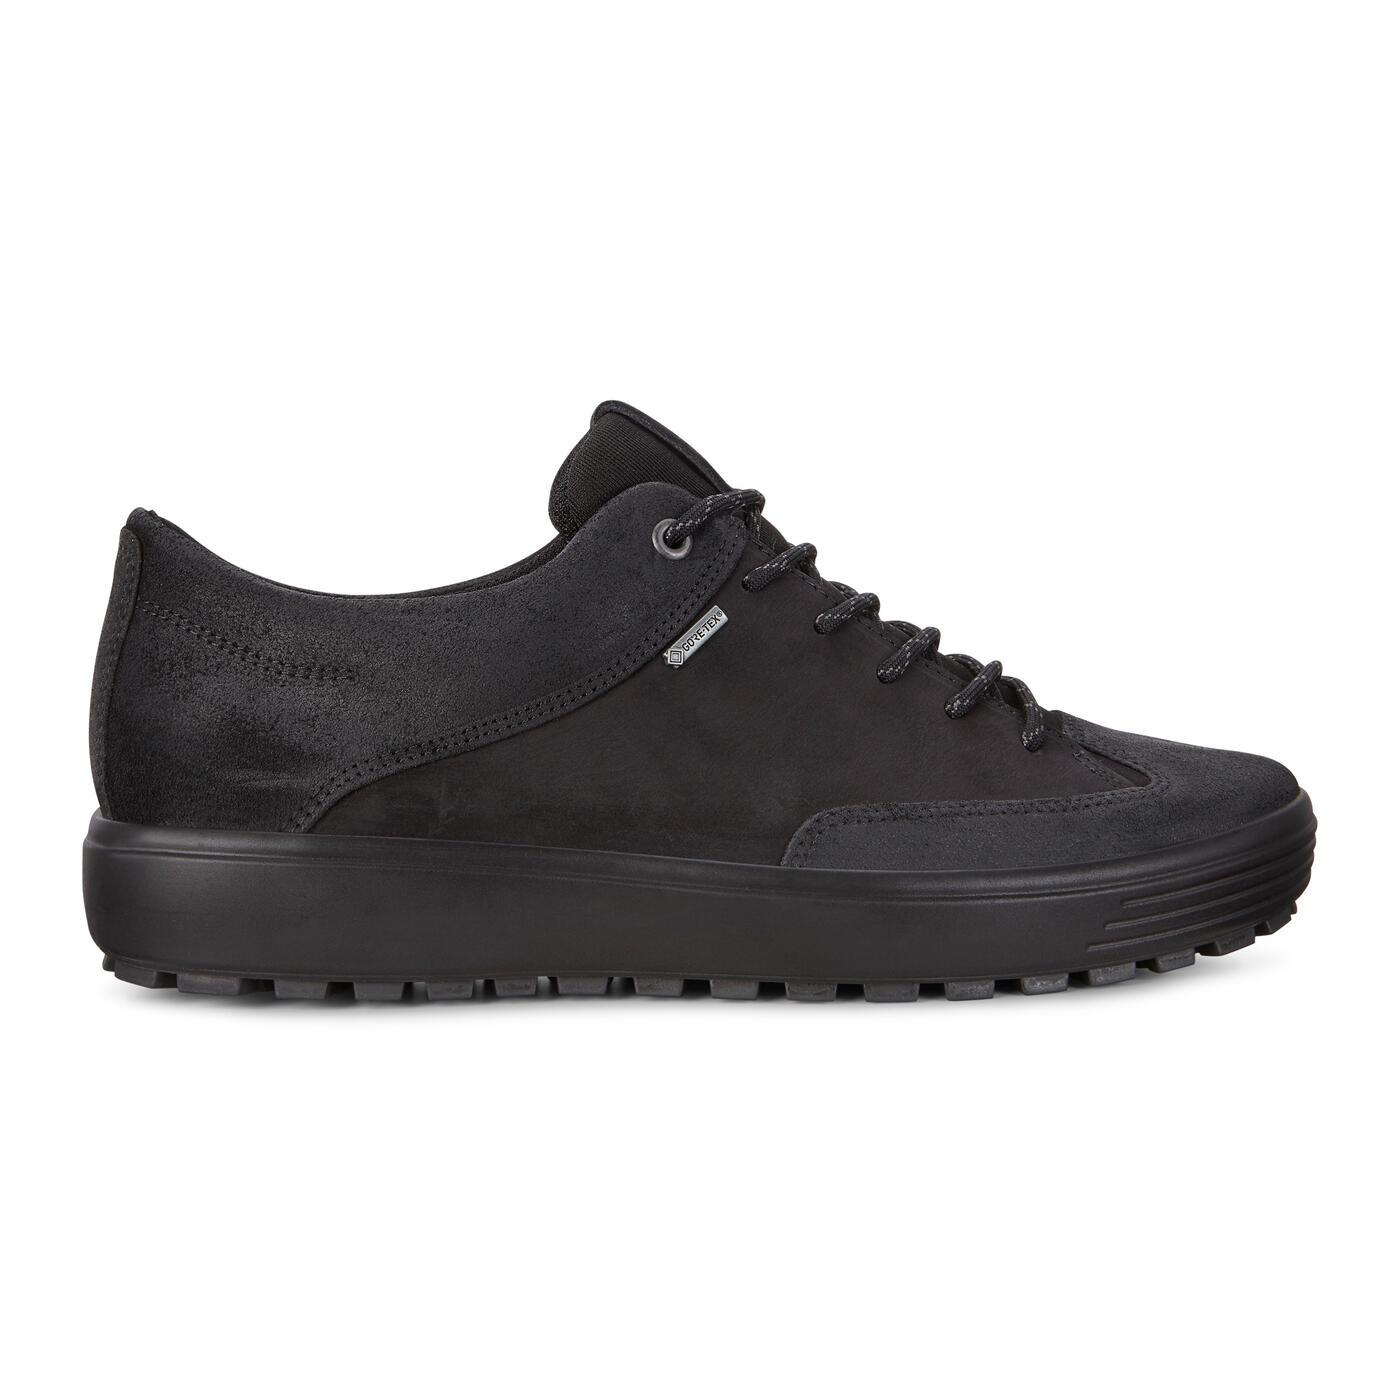 Sneaker ECCO Soft 7 TRED GTX pour hommes